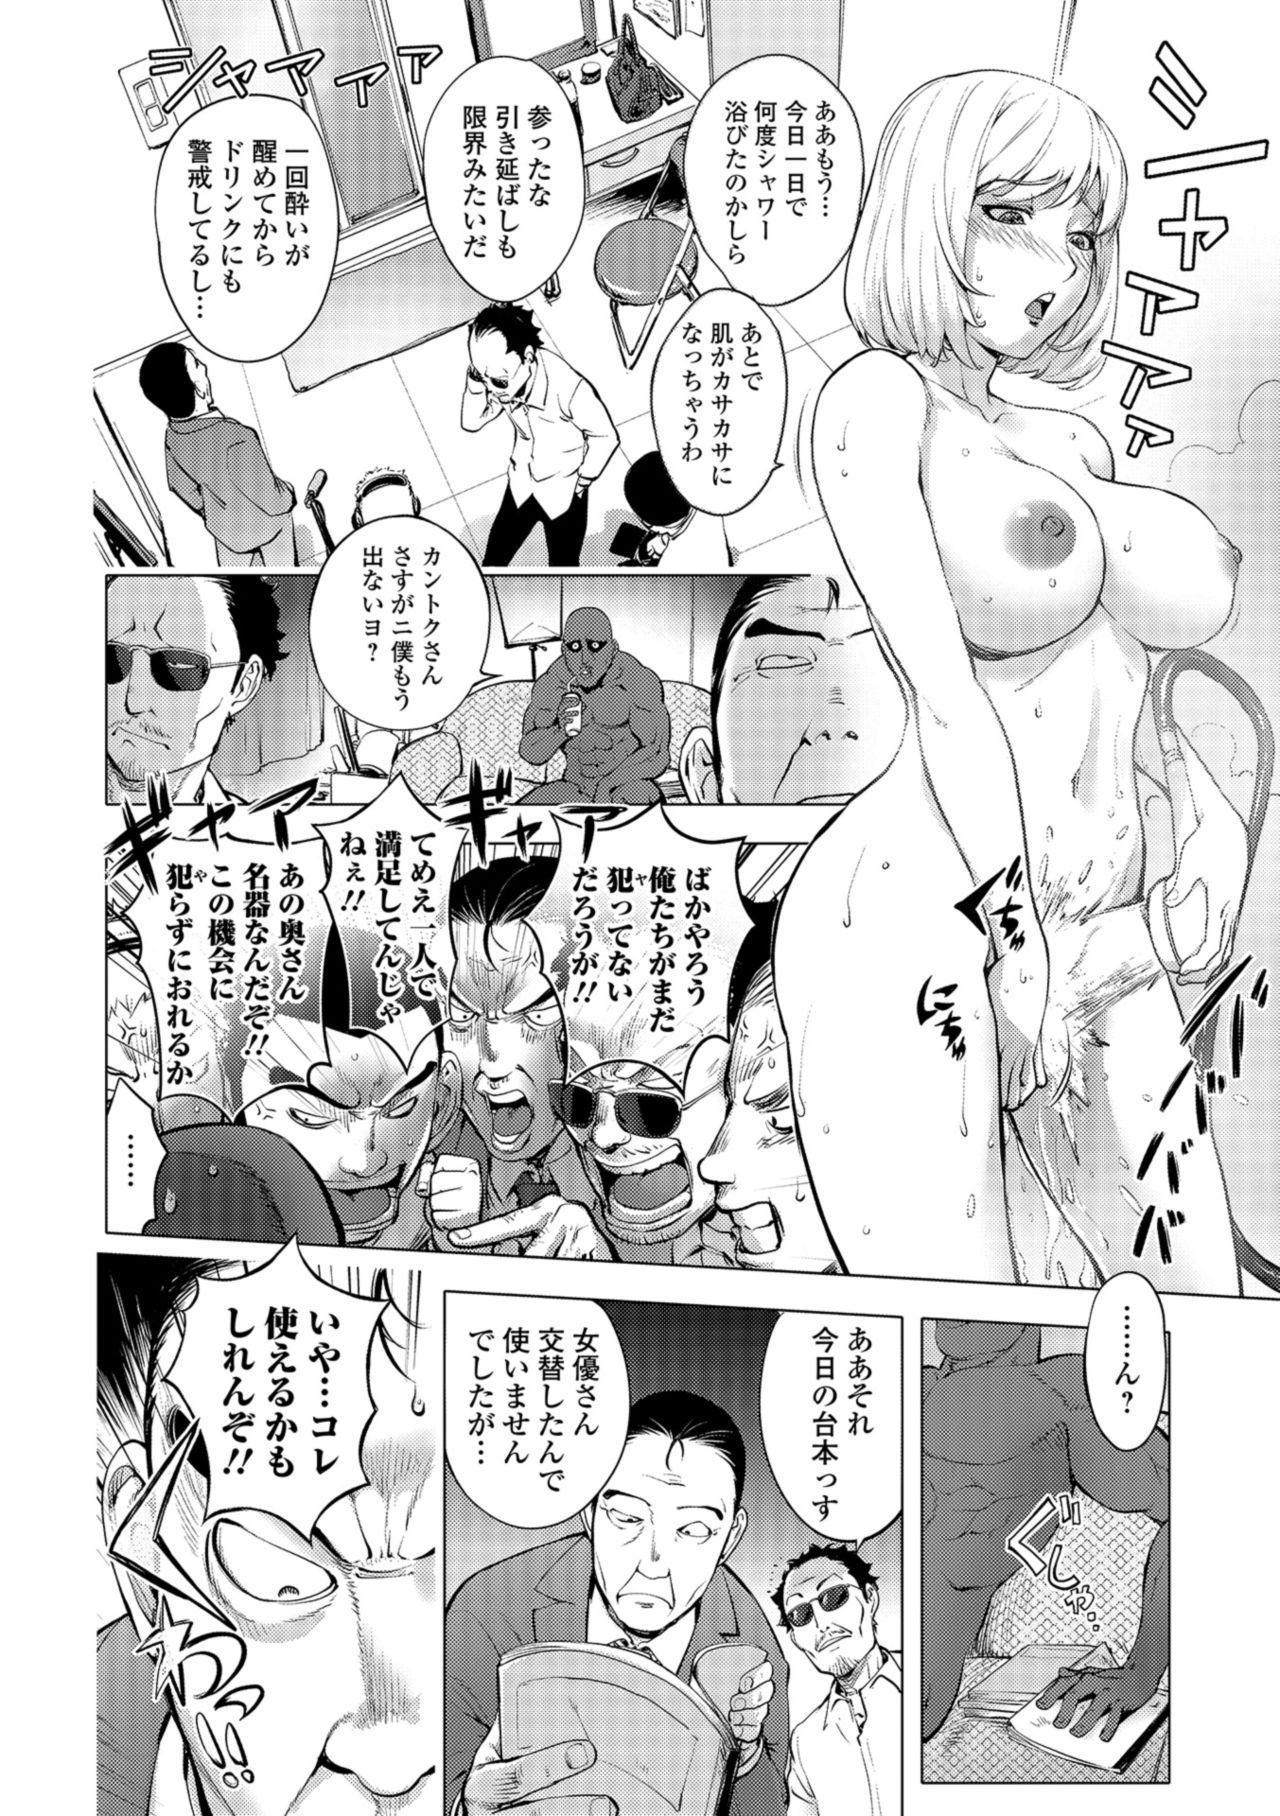 COMIC Shigekiteki SQUIRT!! Vol. 09 59